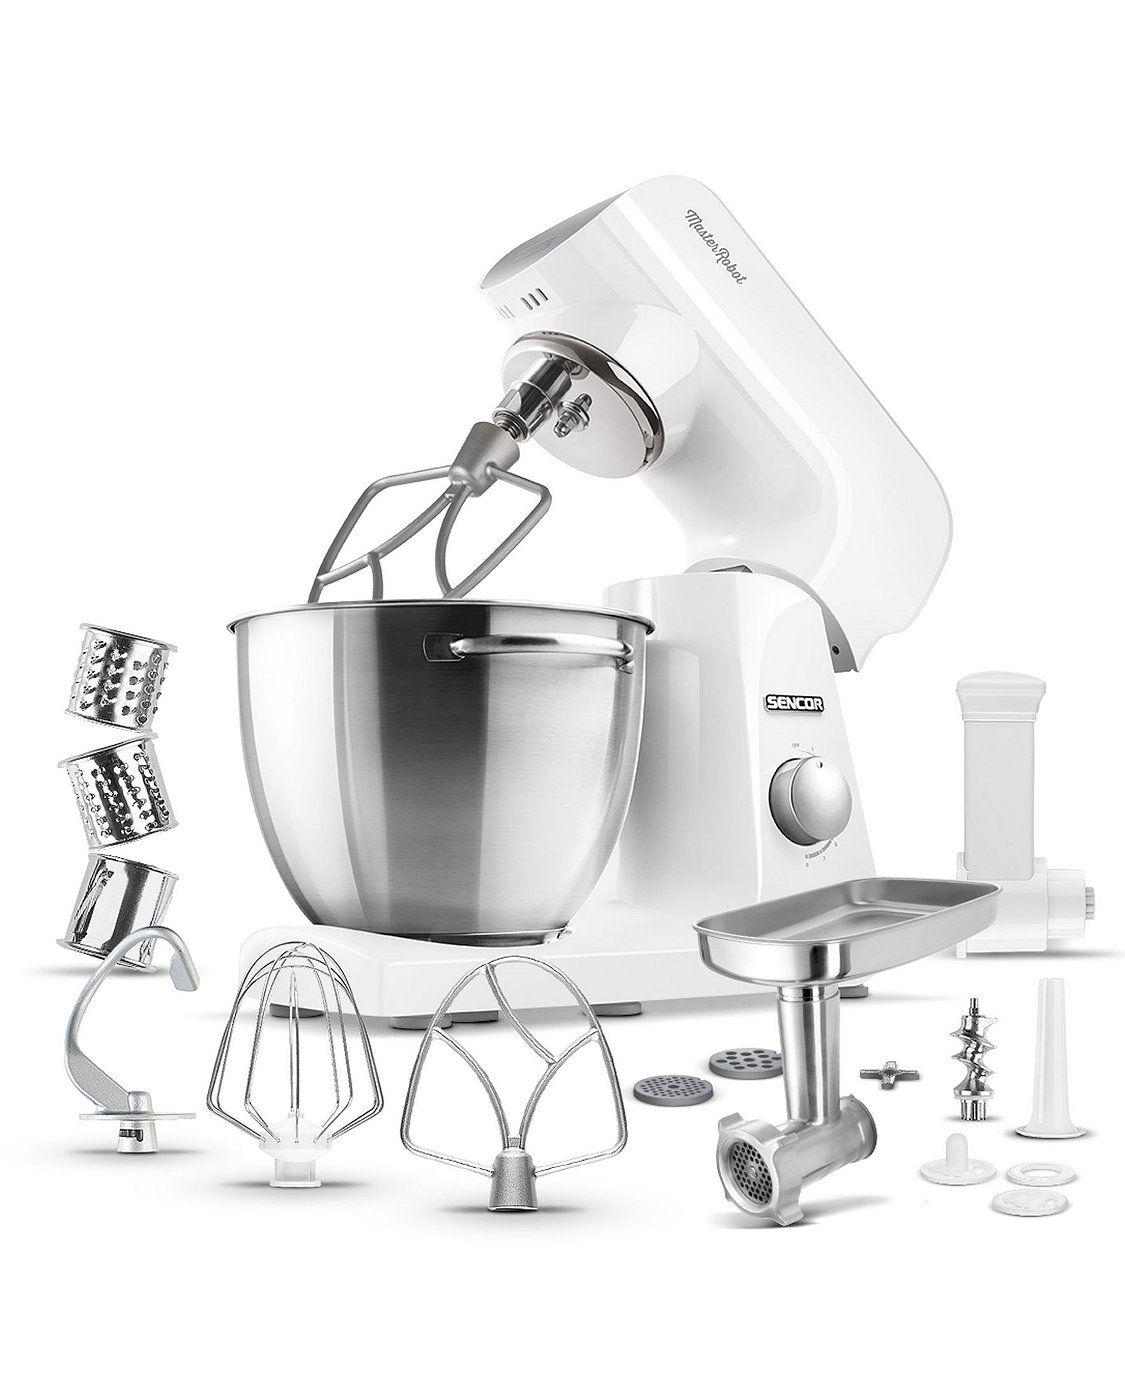 475qt stand mixer stand mixer kitchen stand mixer mixer